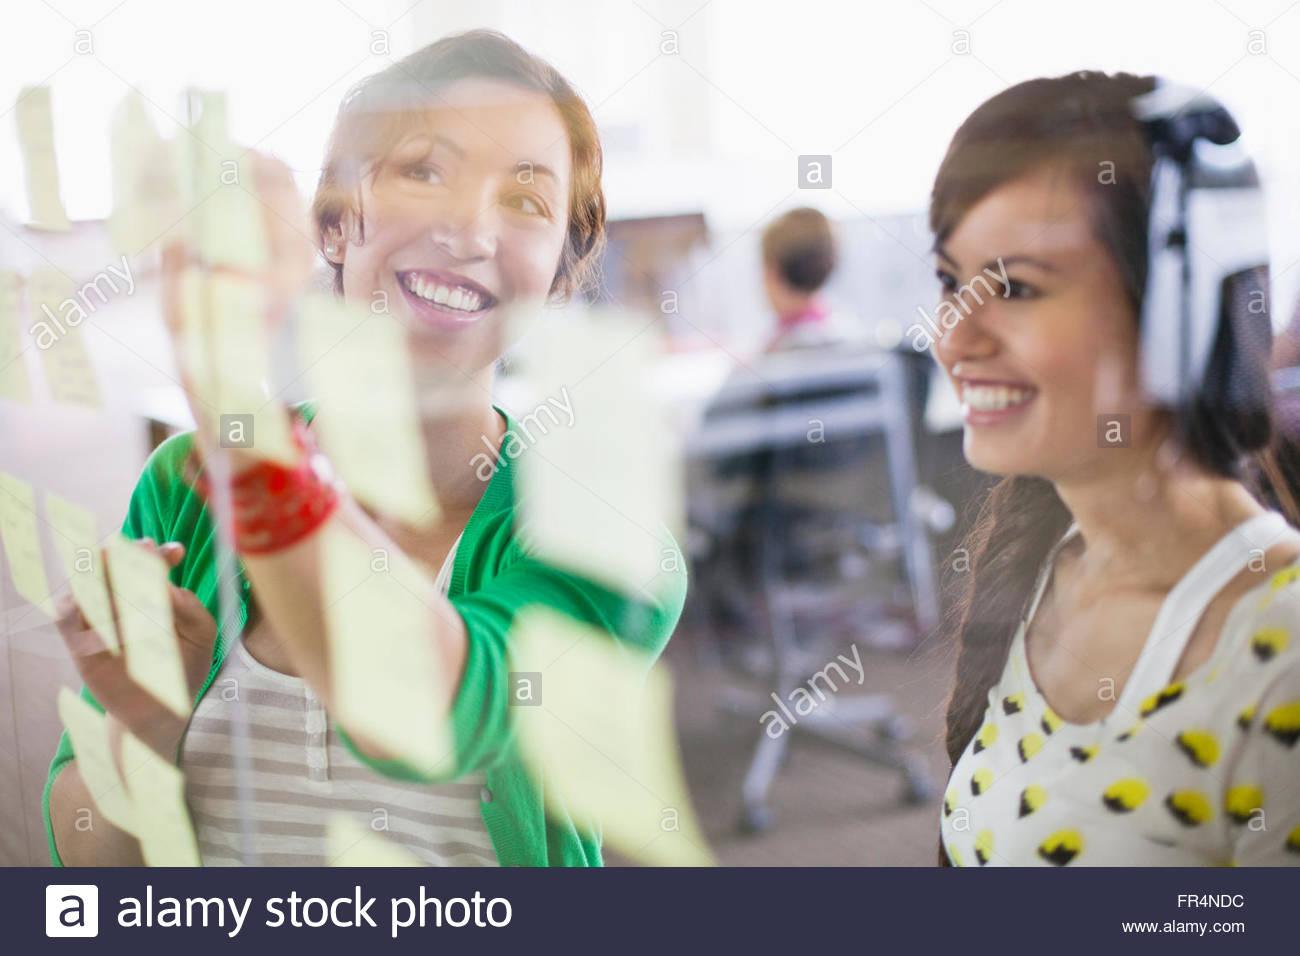 junge Geschäftsfrau Überprüfung Flussdiagramm an Glaswand Stockbild